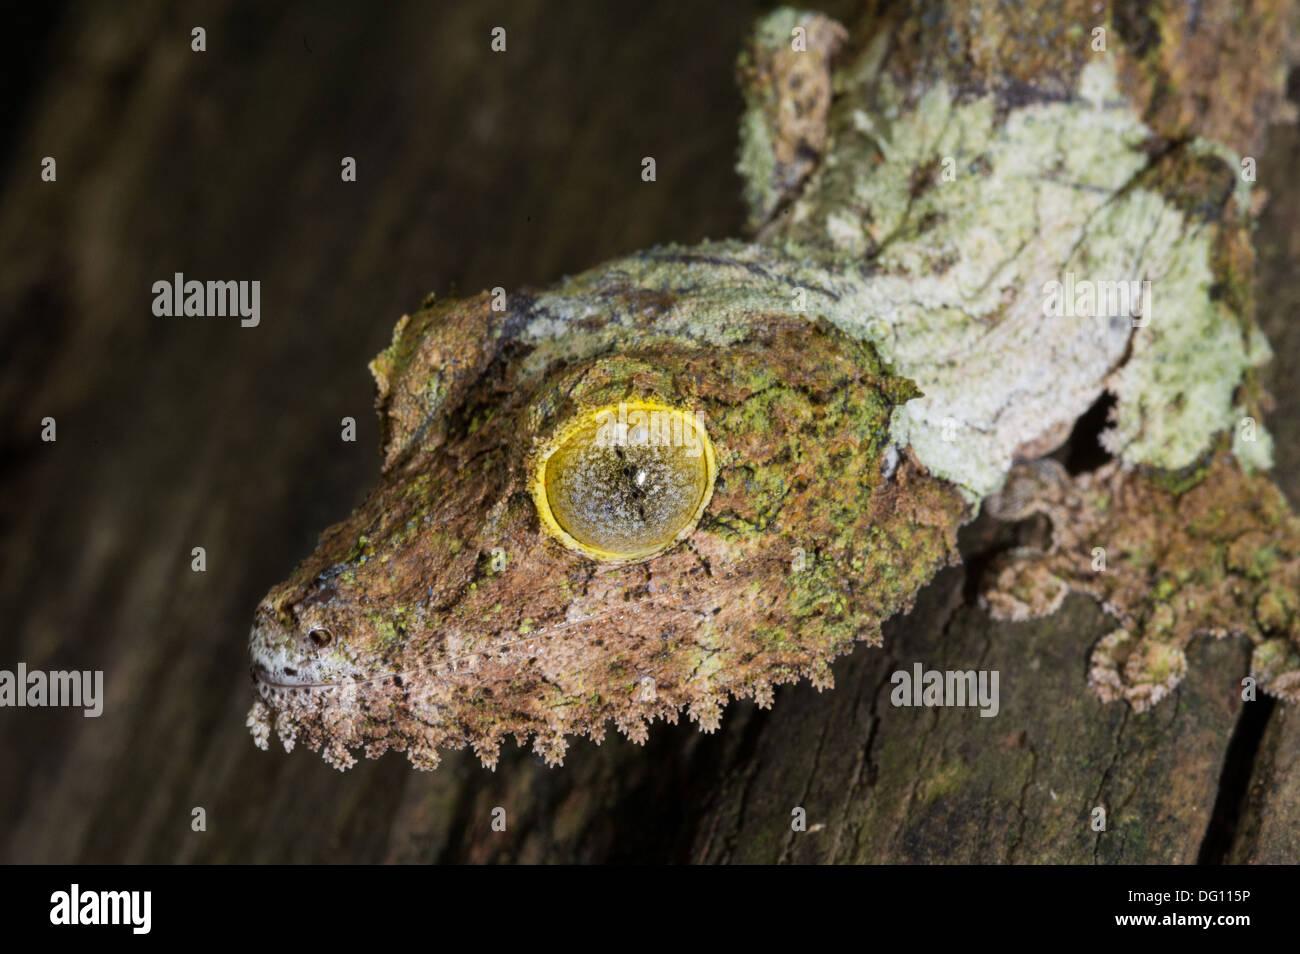 Mossy gecko à queue de feuille, Uroplatus sikorae, Peyrieras Nature Farm, Madagascar Banque D'Images